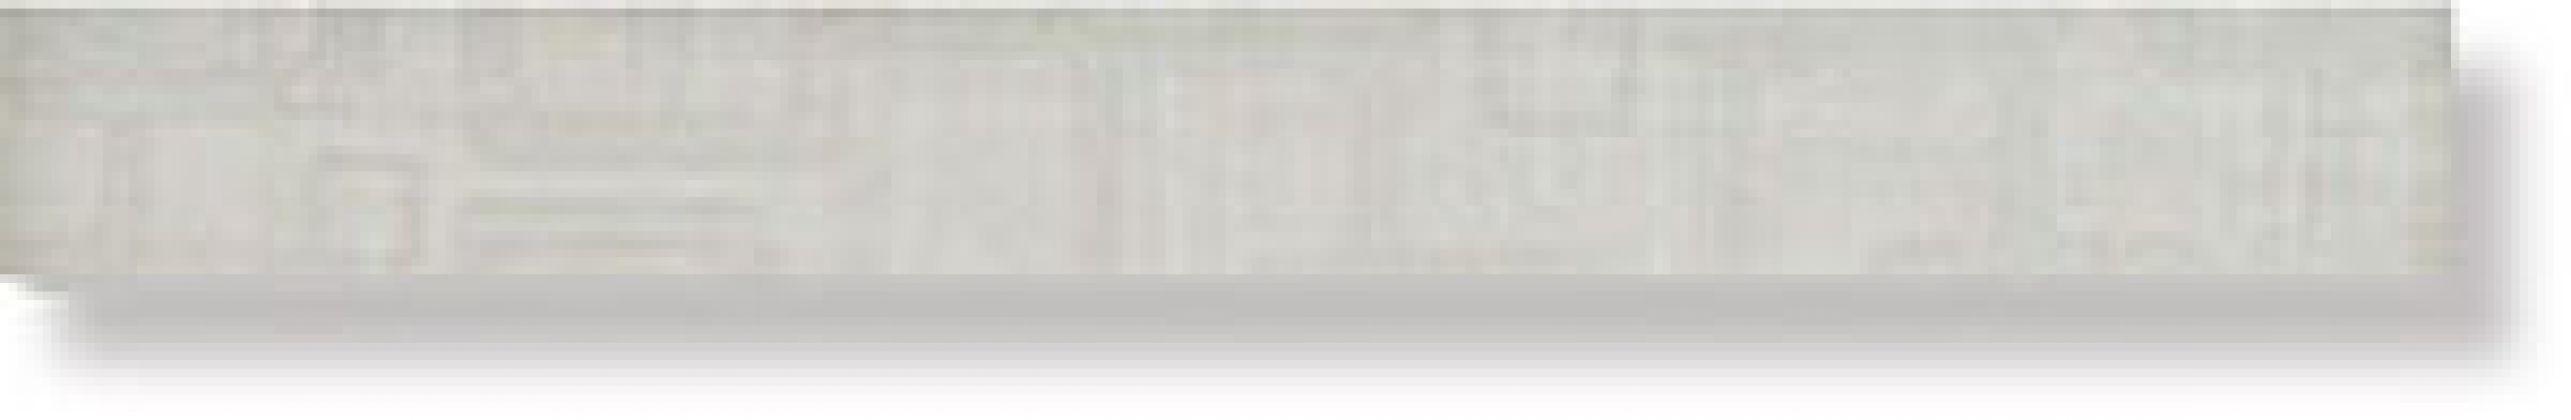 Бордюр Twist Cotton Quadri Fascia 5x45